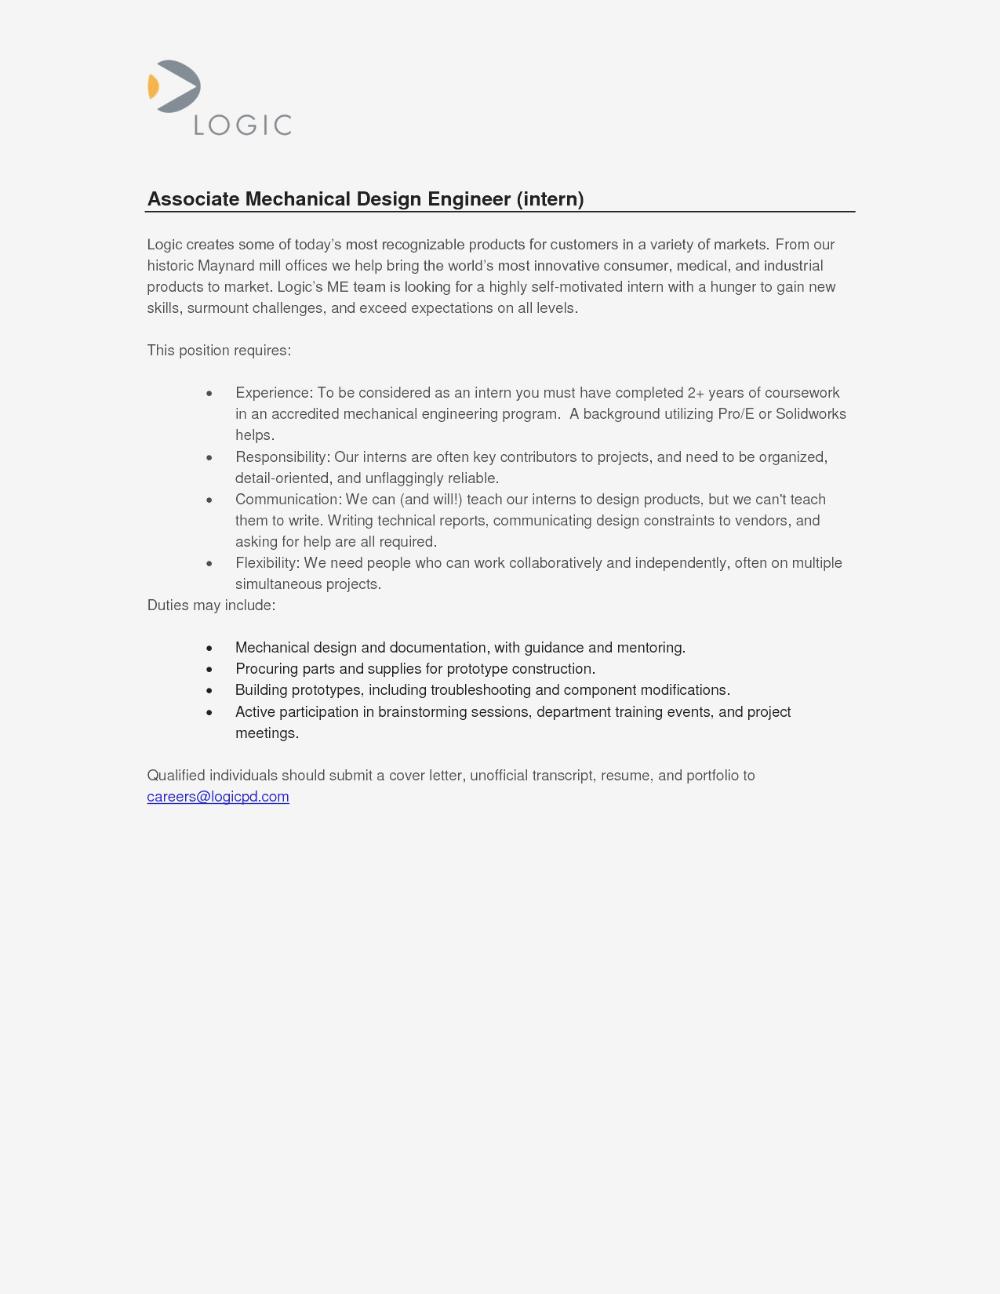 cover letter industrial engineering internship - Orgsan ...